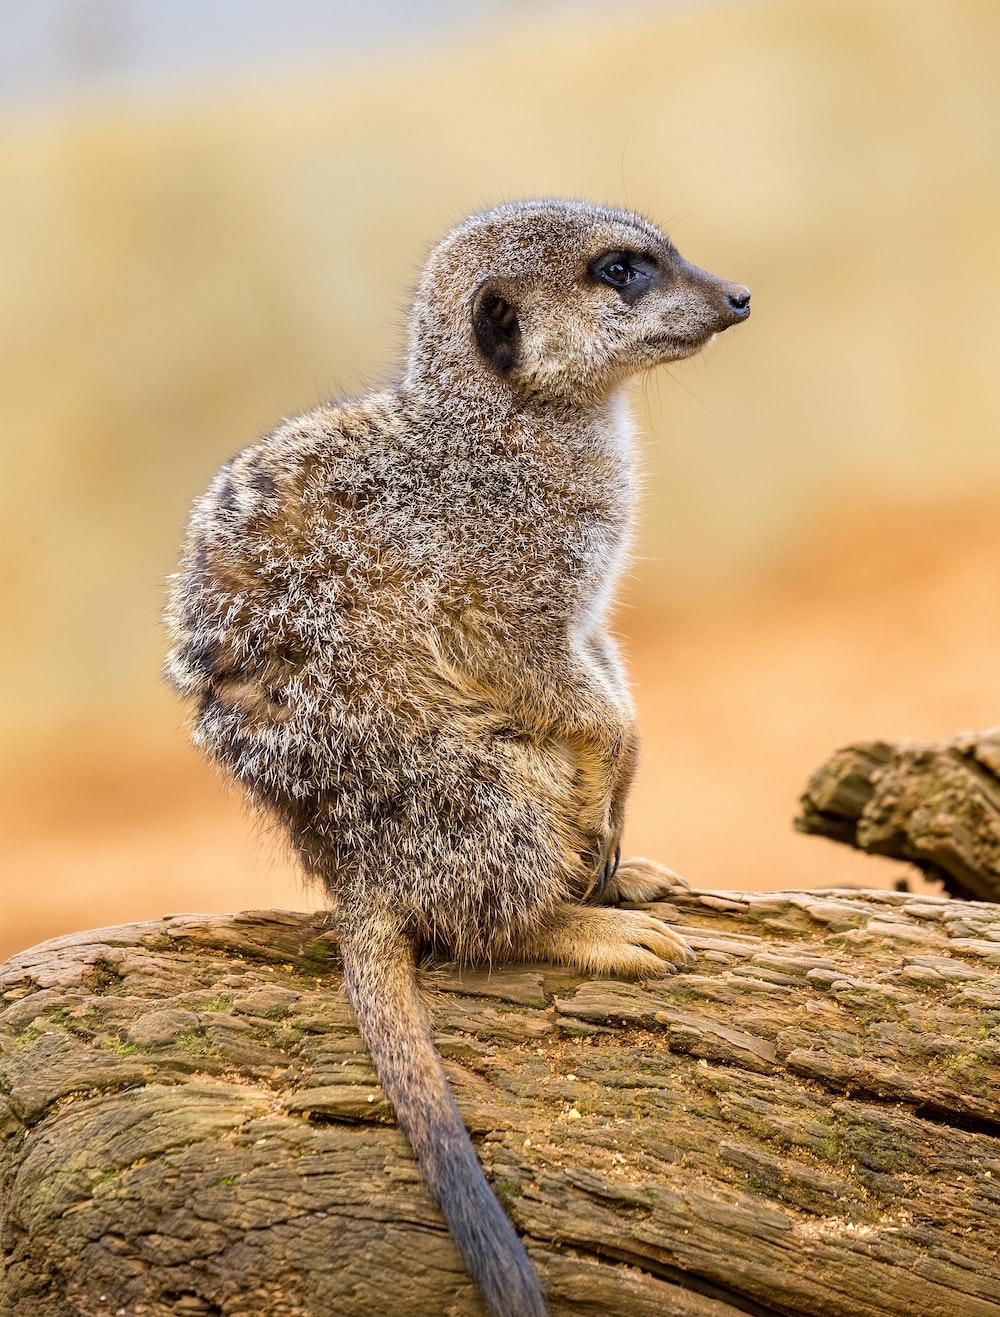 brown meerkat standing on wooden log